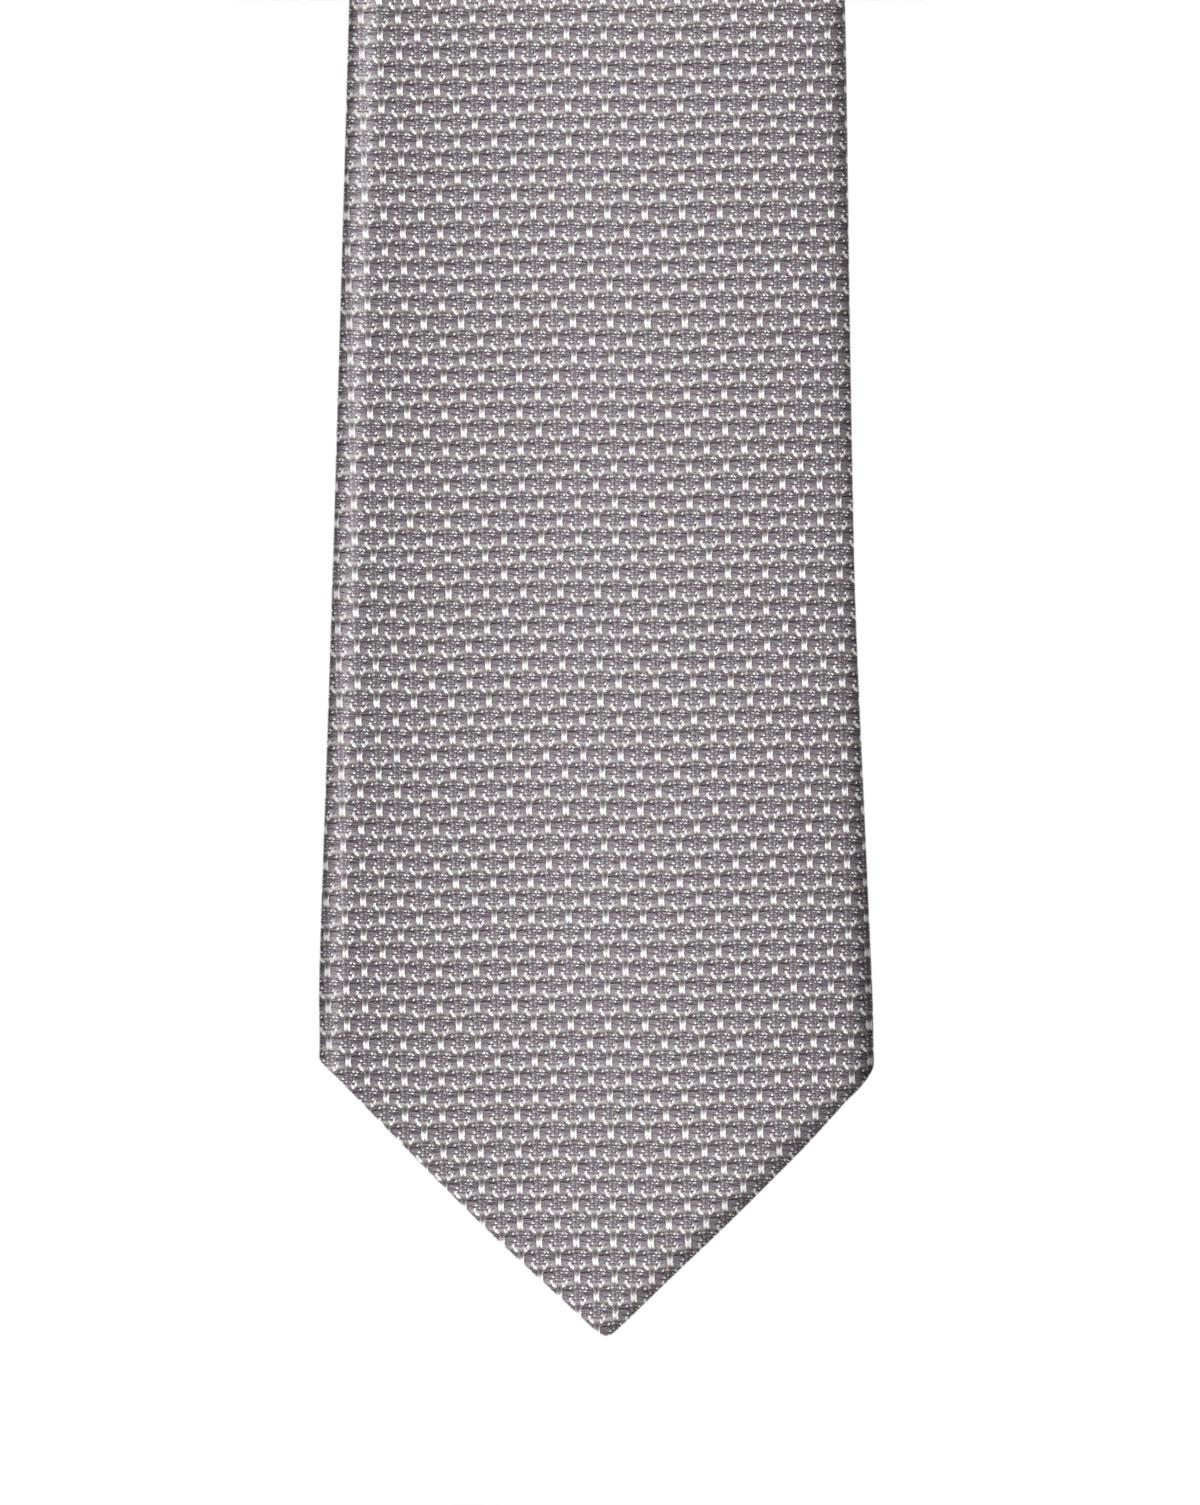 Medium Grey with White Grenadine Necktie